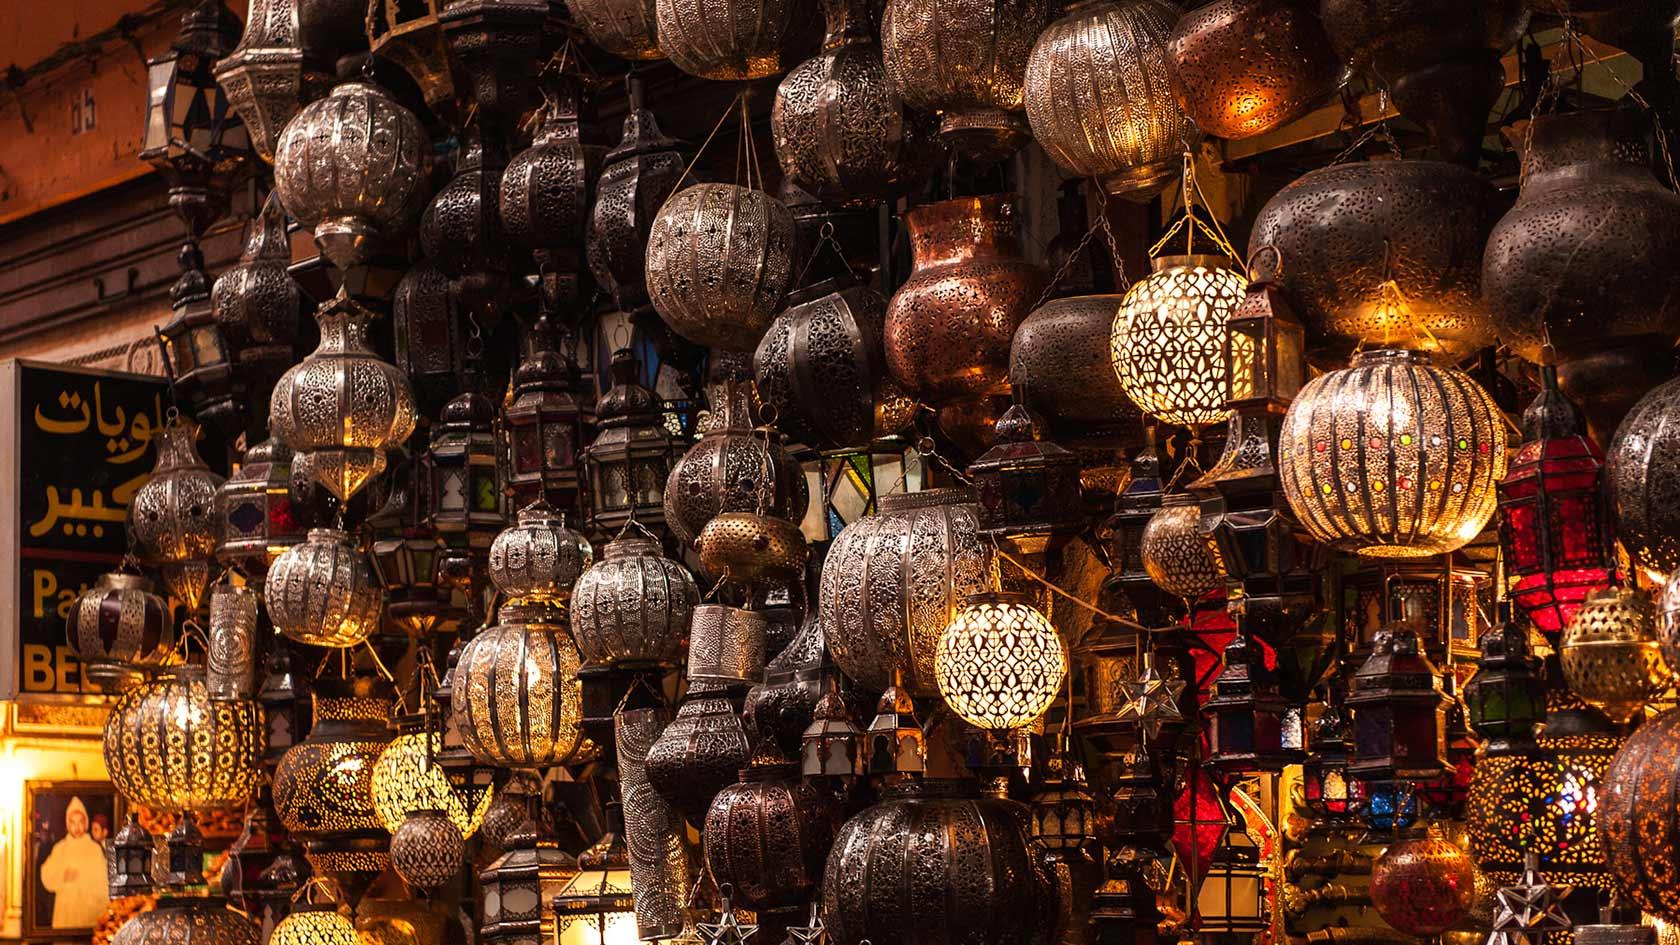 darragh-mason-field-marrakech-morocco-5